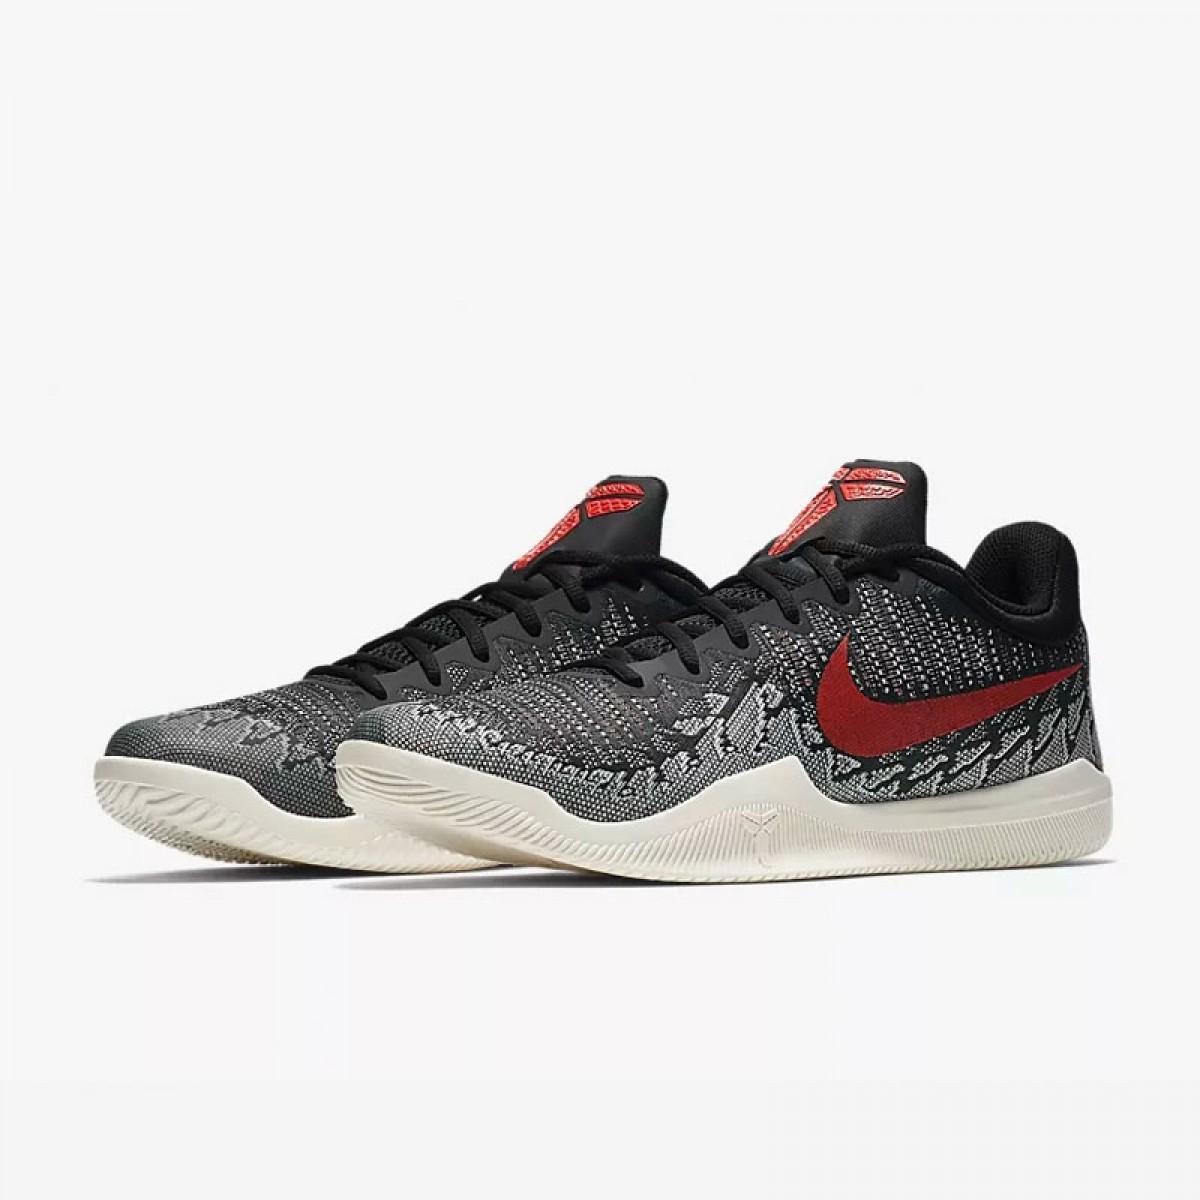 eef7992cbd9 Buy Nike Mamba Rage  Black Mamba  Basketball shoes   sneakers